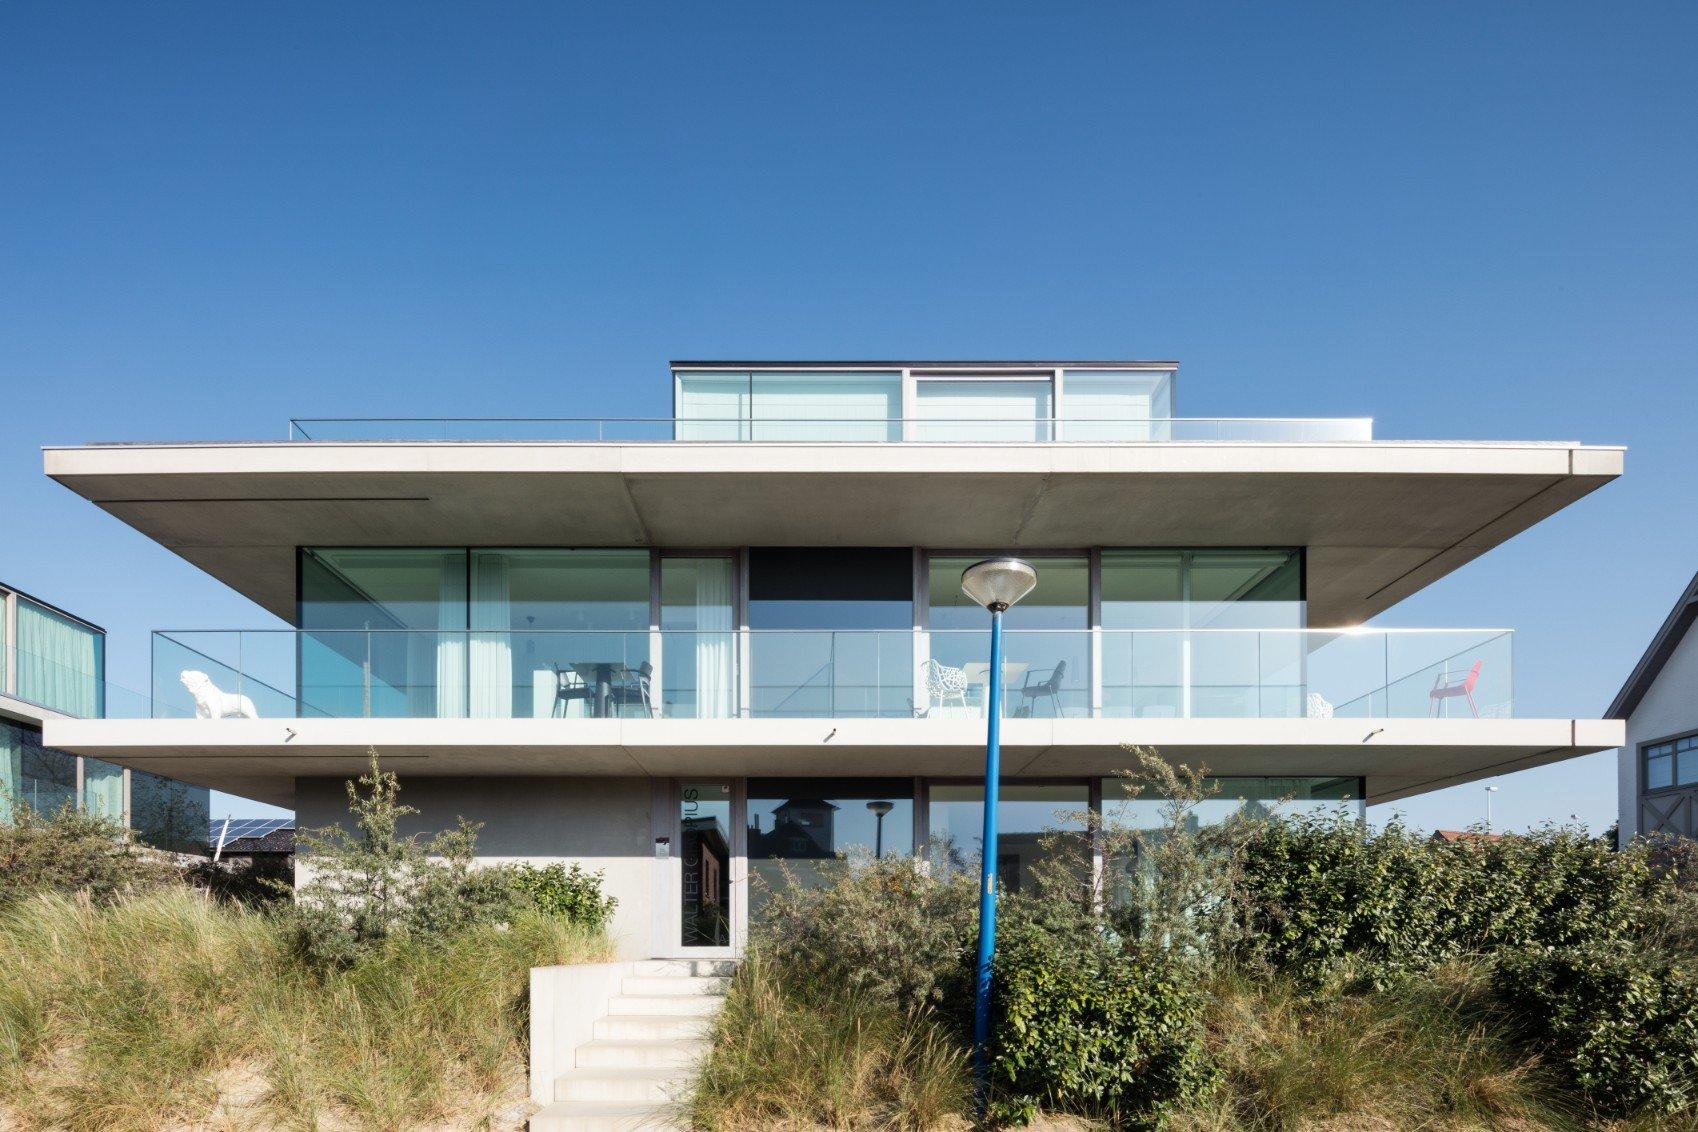 Rietveldprojects.be-Twins-Gropius-Breuer-appartement-design-architectuur-kust15